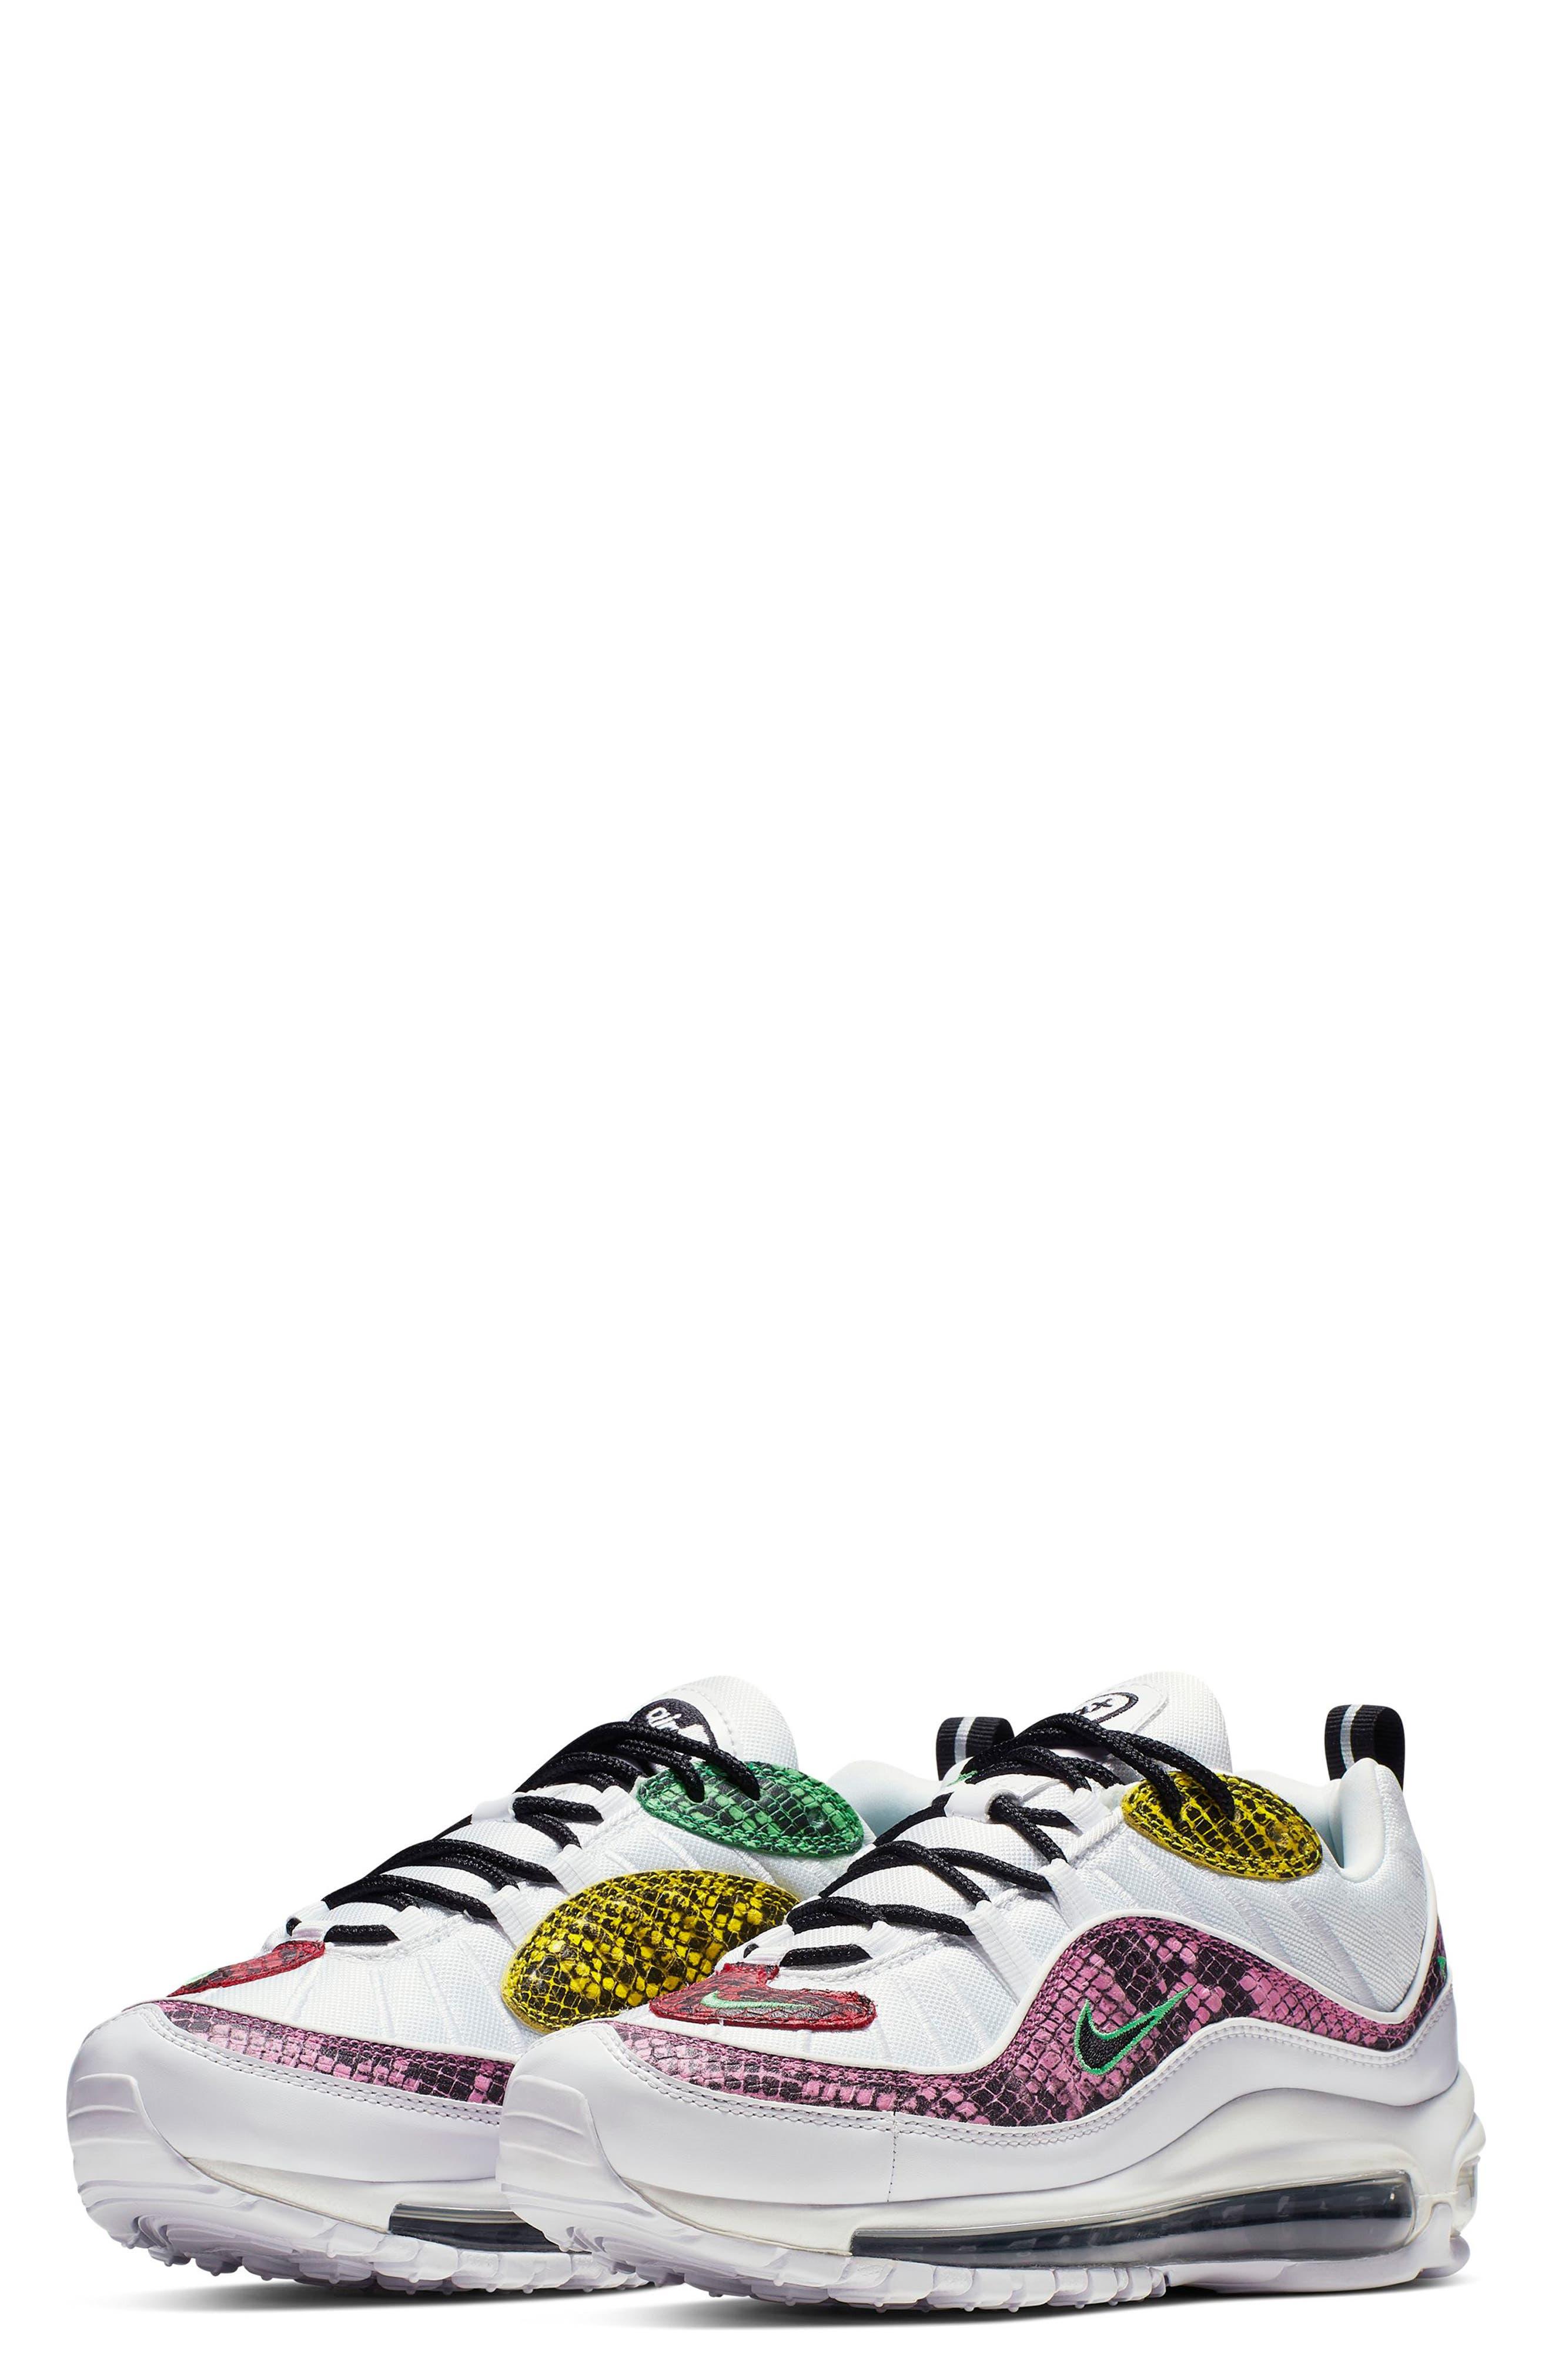 Air Max 98 Premium Sneaker, Main, color, WHITE/ BLACK